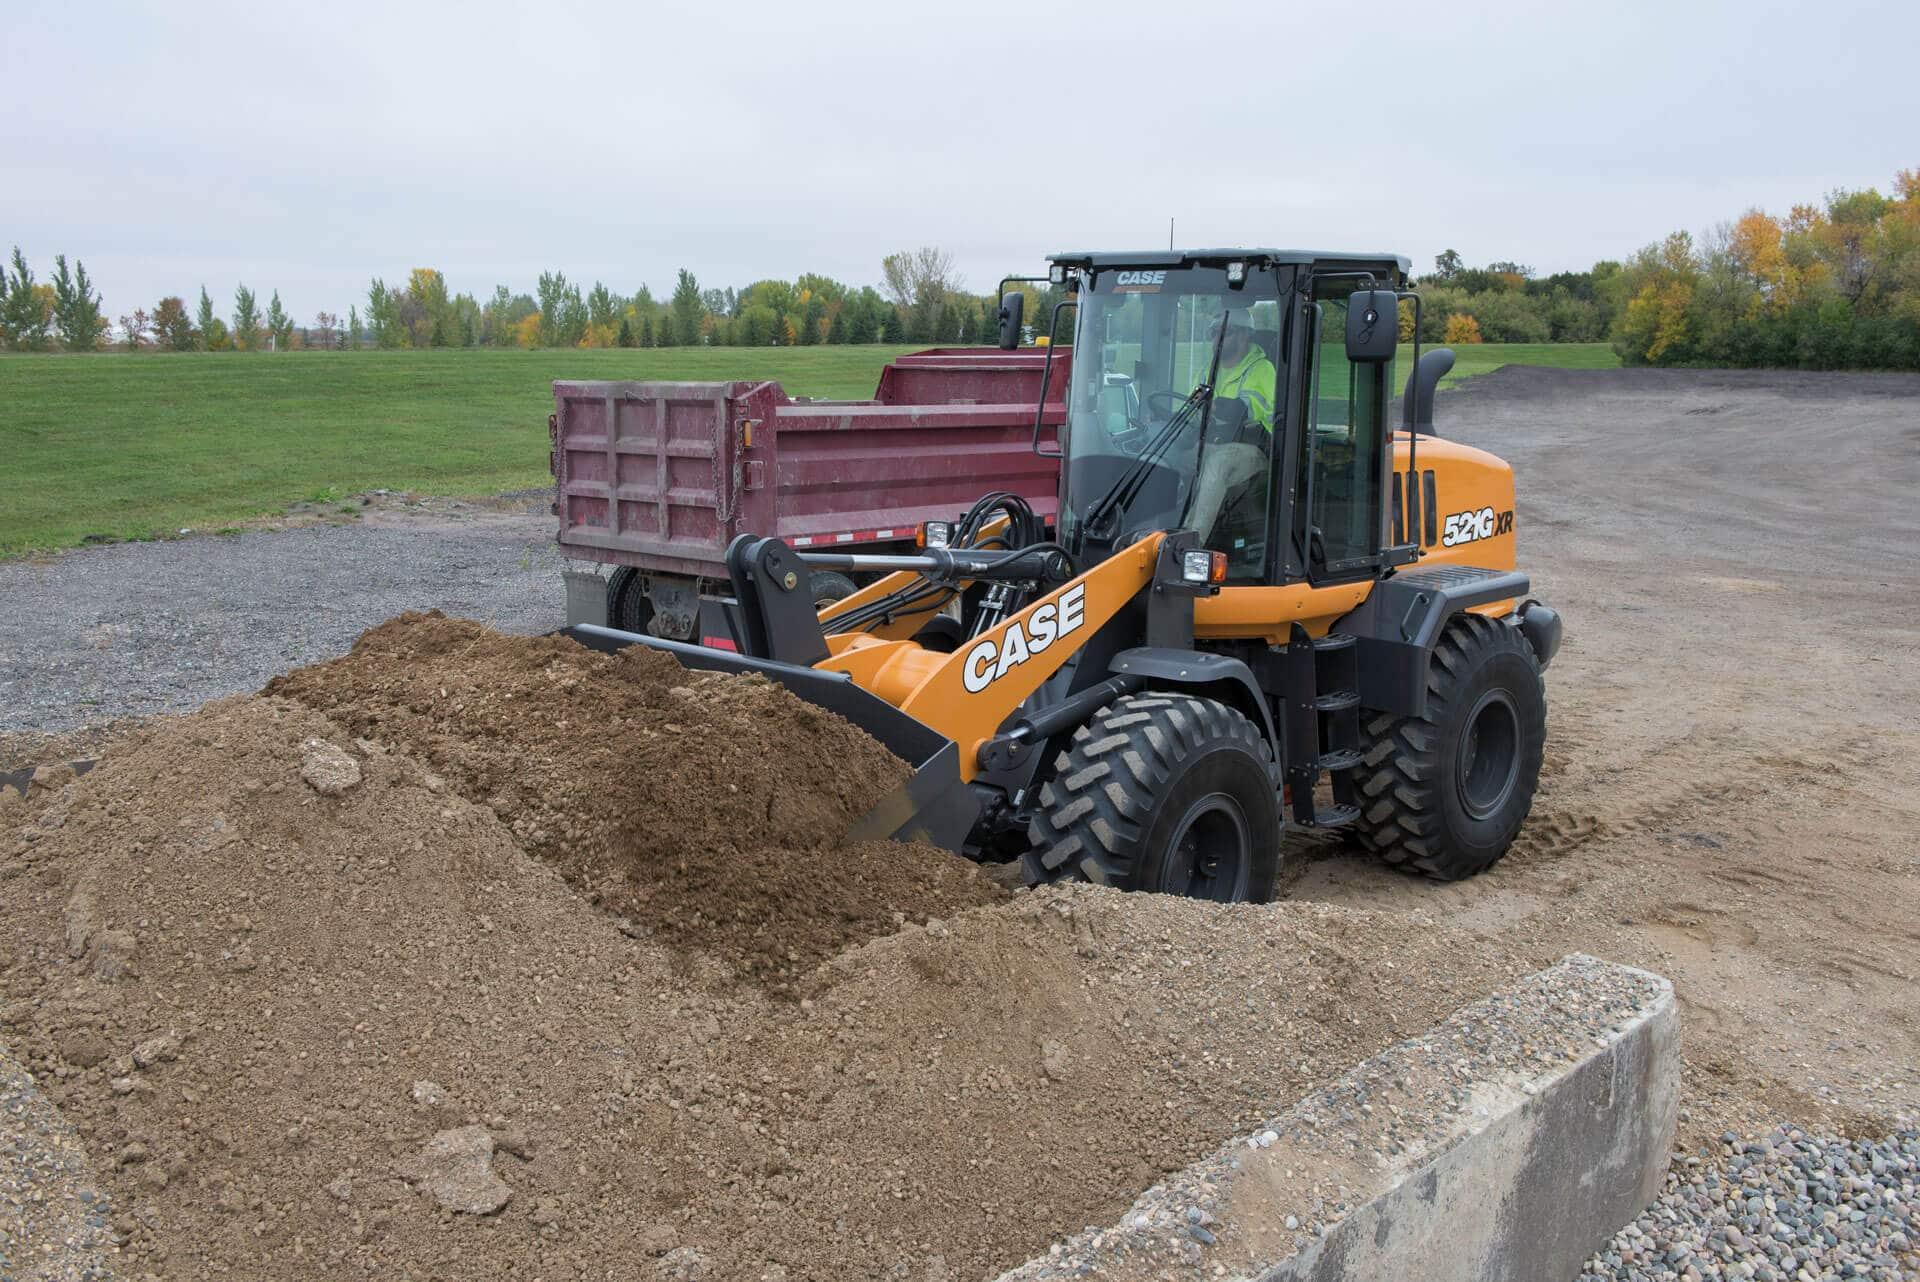 521Gxr__RJP1750?Width=800&Height=276 case 521g wheel loader case construction equipment